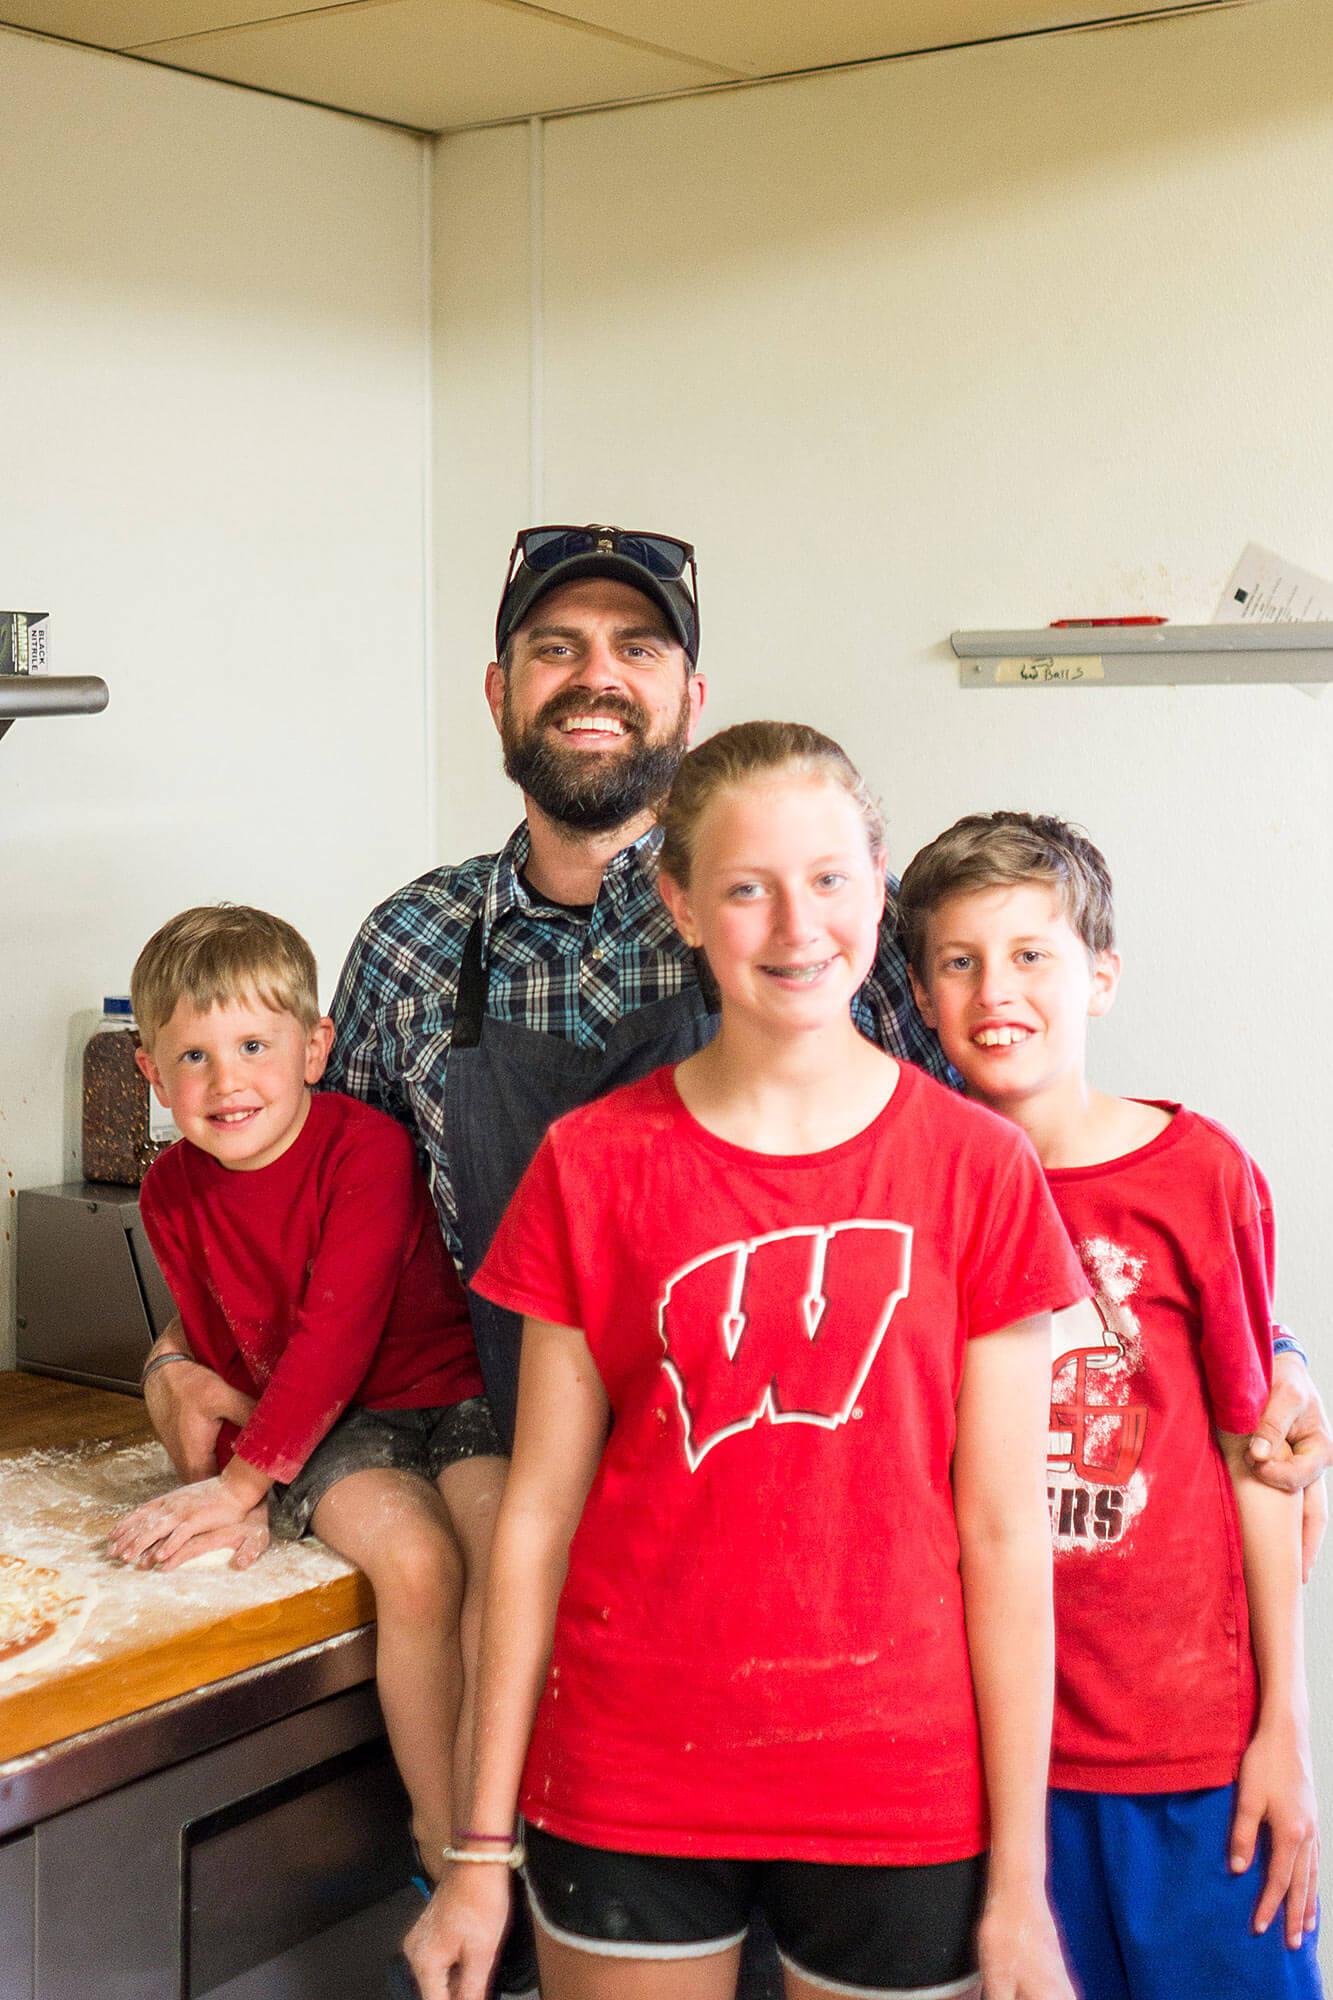 Chef Luke Zahm and his kids at the Driftless Cafe, Viroqua, Wisconsin | Driftless Cafe chef Luke Zahm is James Beard Award semifinalist